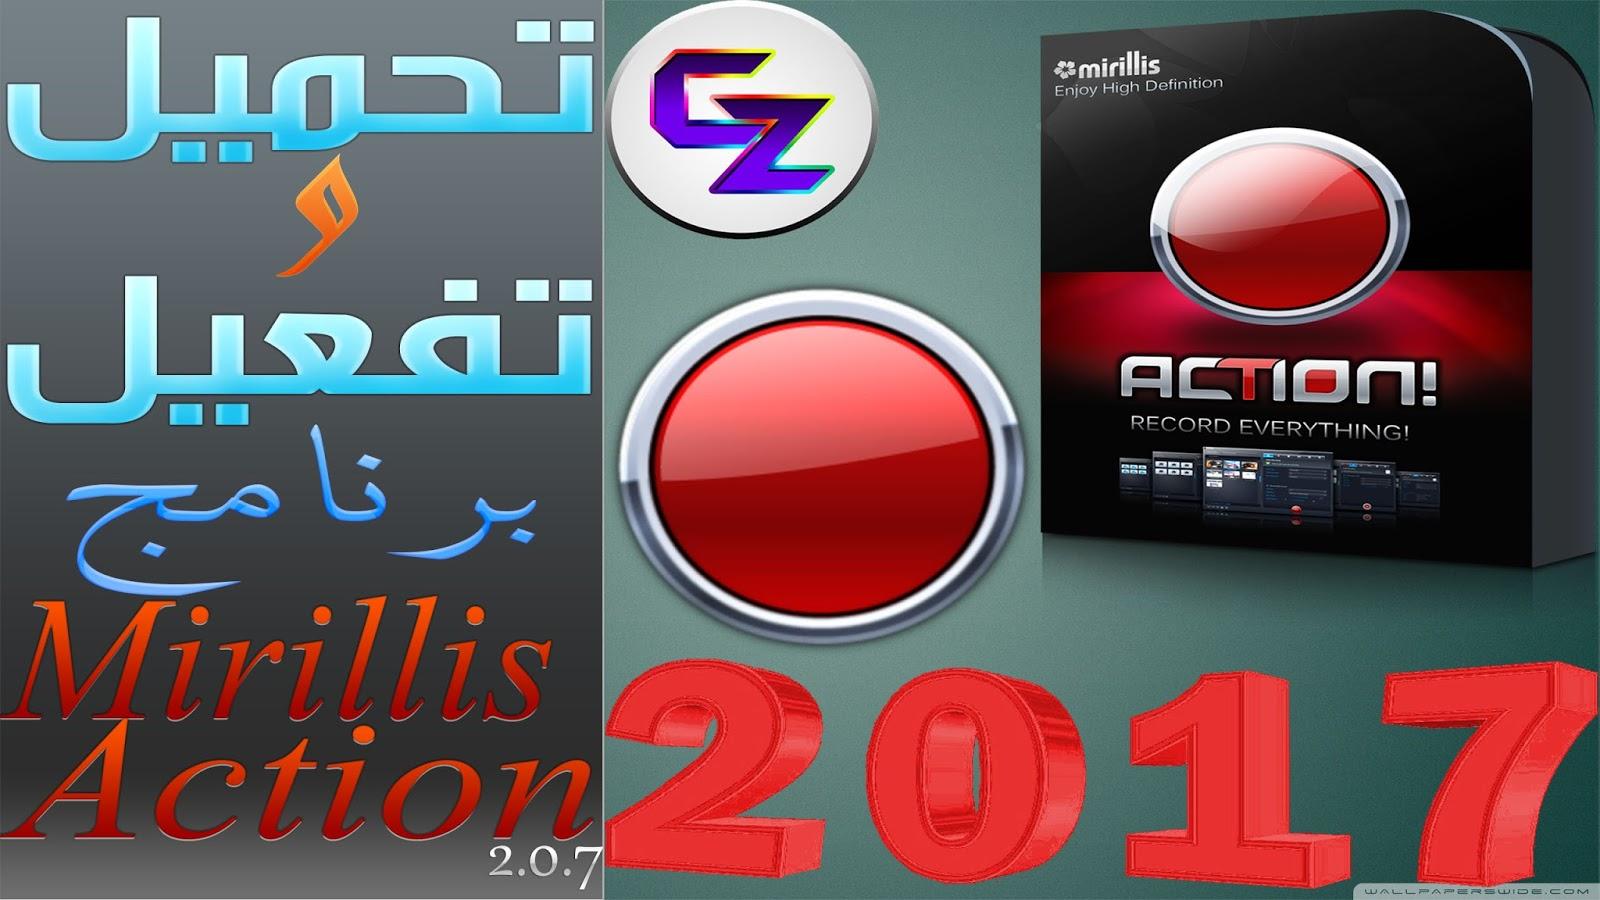 Mirillis Action 207